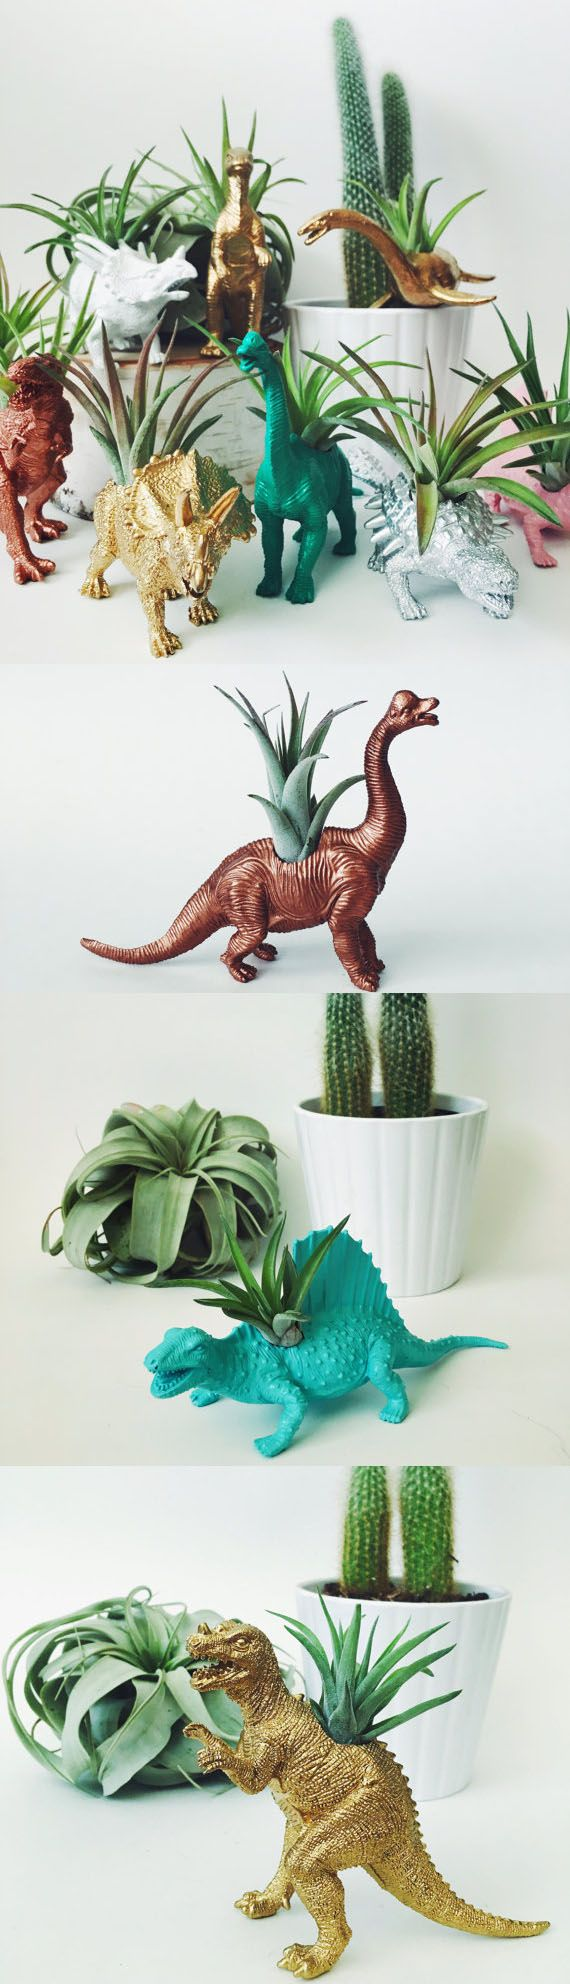 Custom Dinosaur Air Planter // Home decor gardening dinos